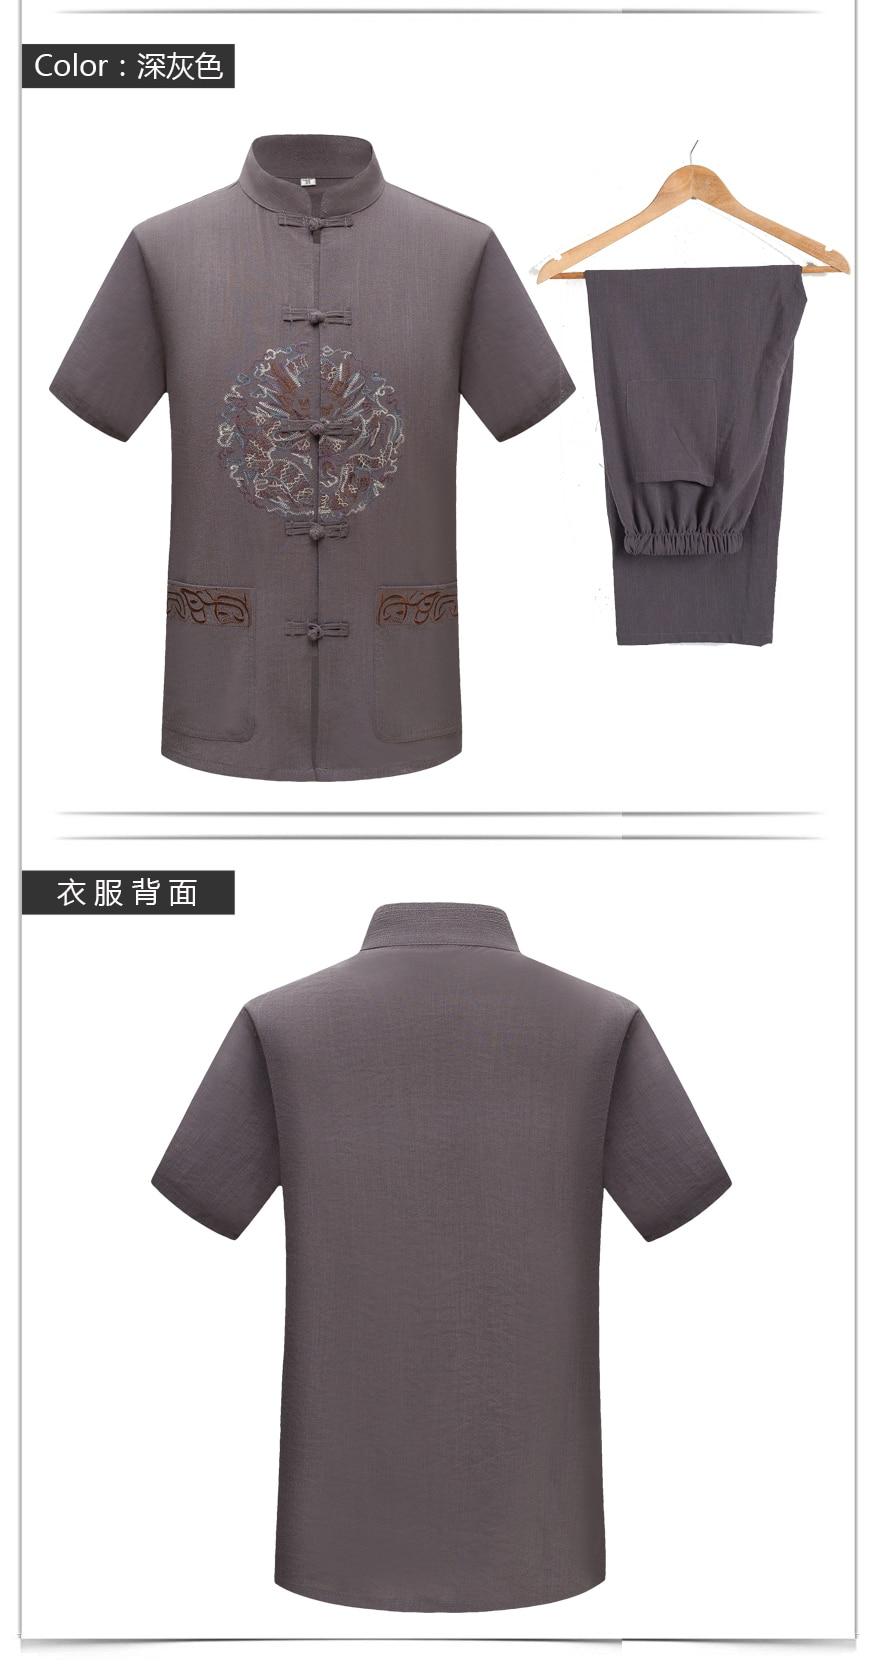 WAEOLSA Men Ethnical Shirt And Pant Suits Black Dark Gray Twinset Man Linen Tang Tunic and Trouser Set Male Oriental 2PCS Pant Suits Set Summer (5)